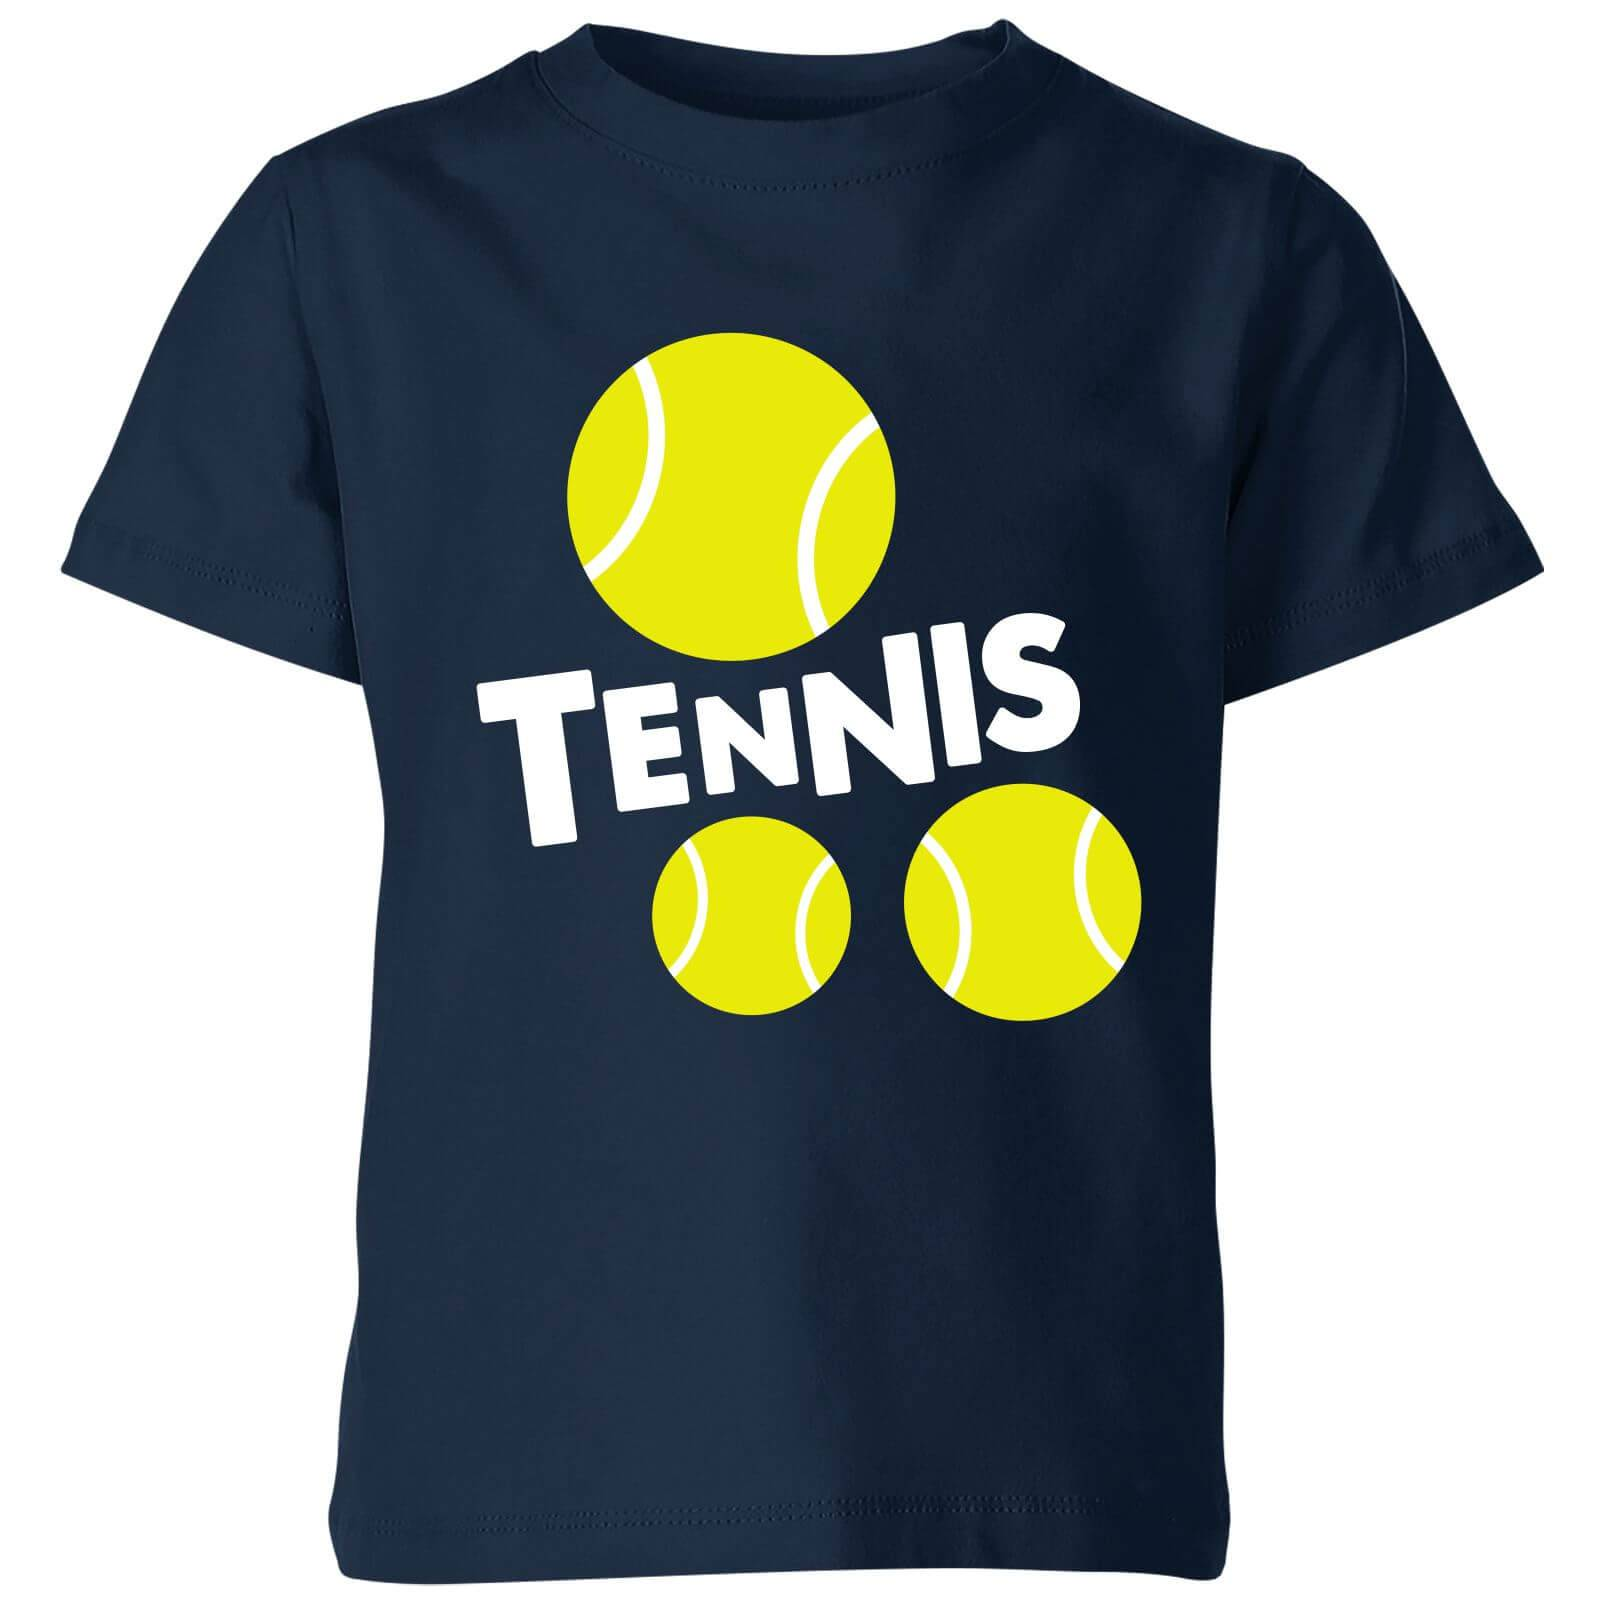 The Tennis Collection Tennis Balls Kids' T-Shirt - Navy - 7-8 Years - Navy